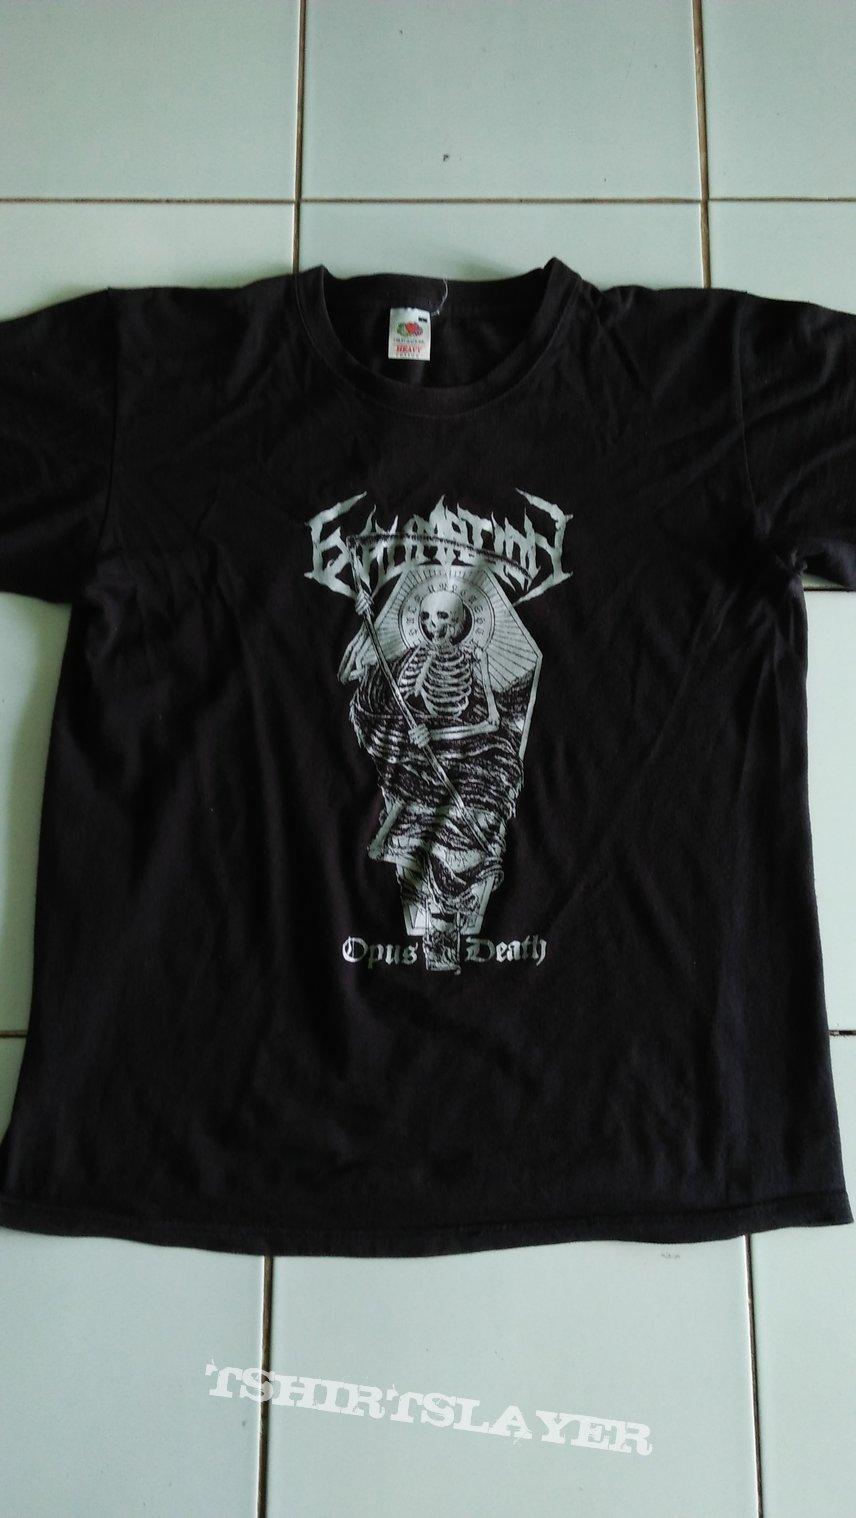 Exhumation - Opus Death tour shirt